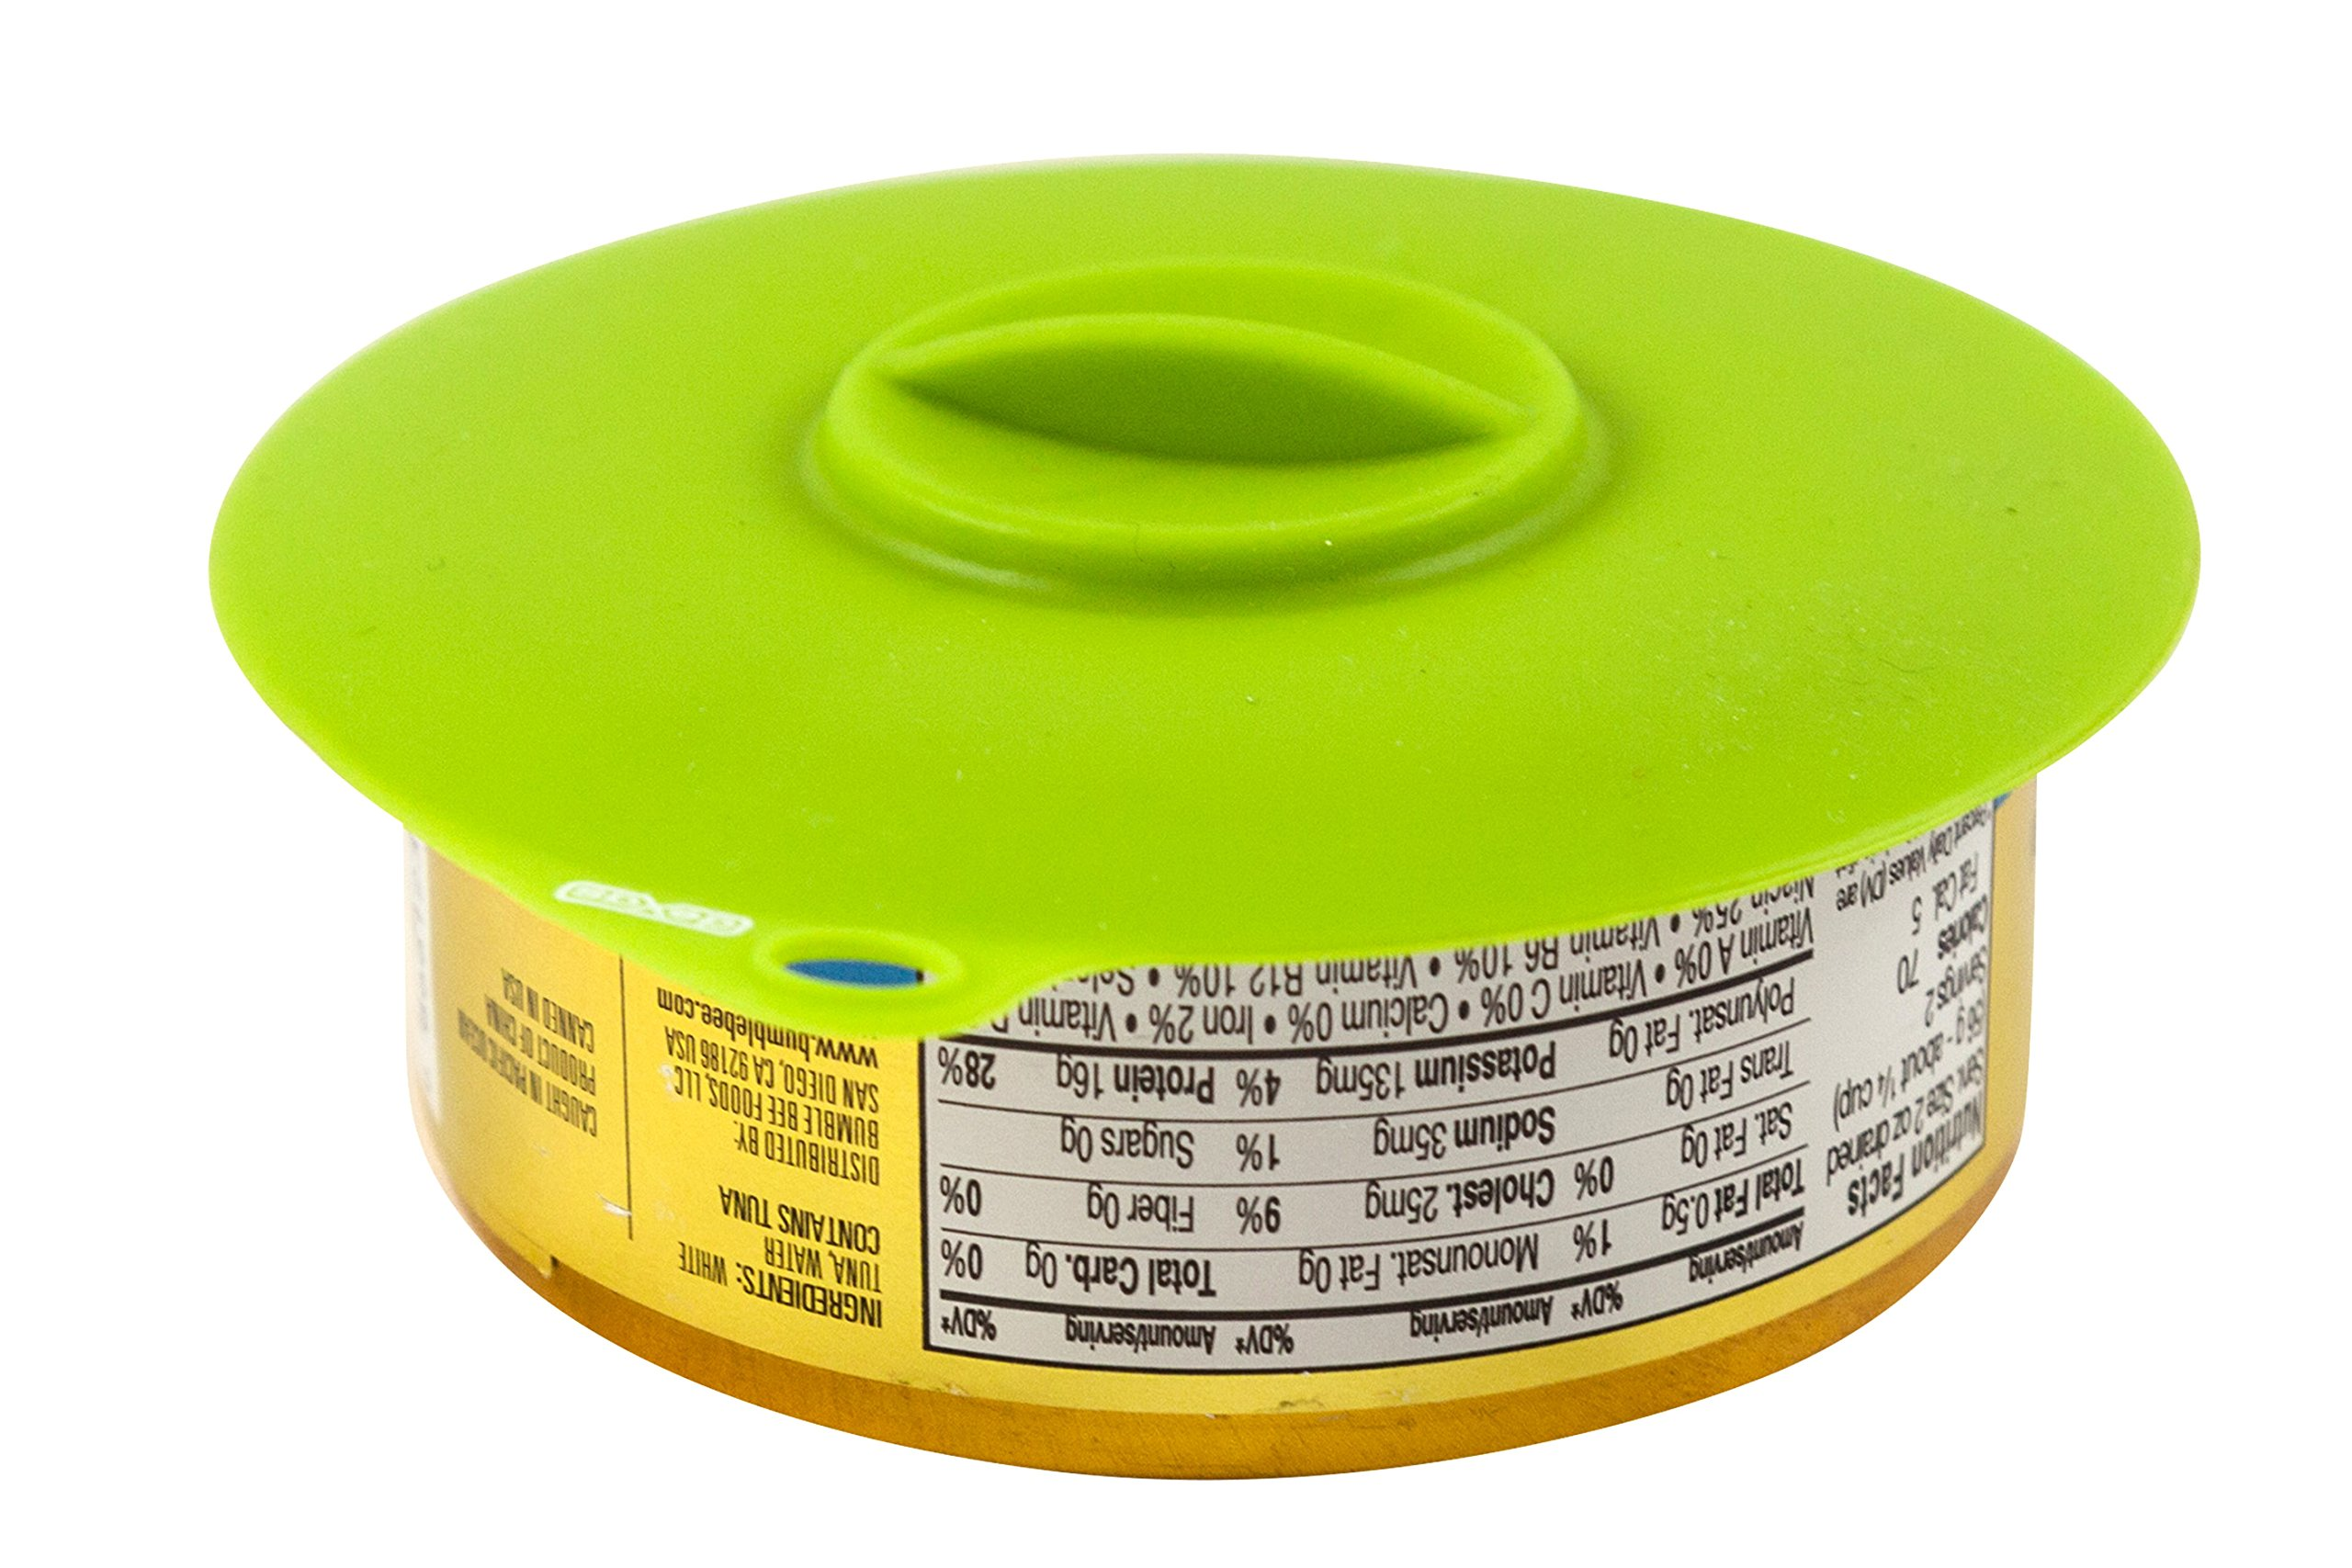 Dexas Popware for Pets 4 Inch (10 cm) Flexible Suction Lid, 2-Pack